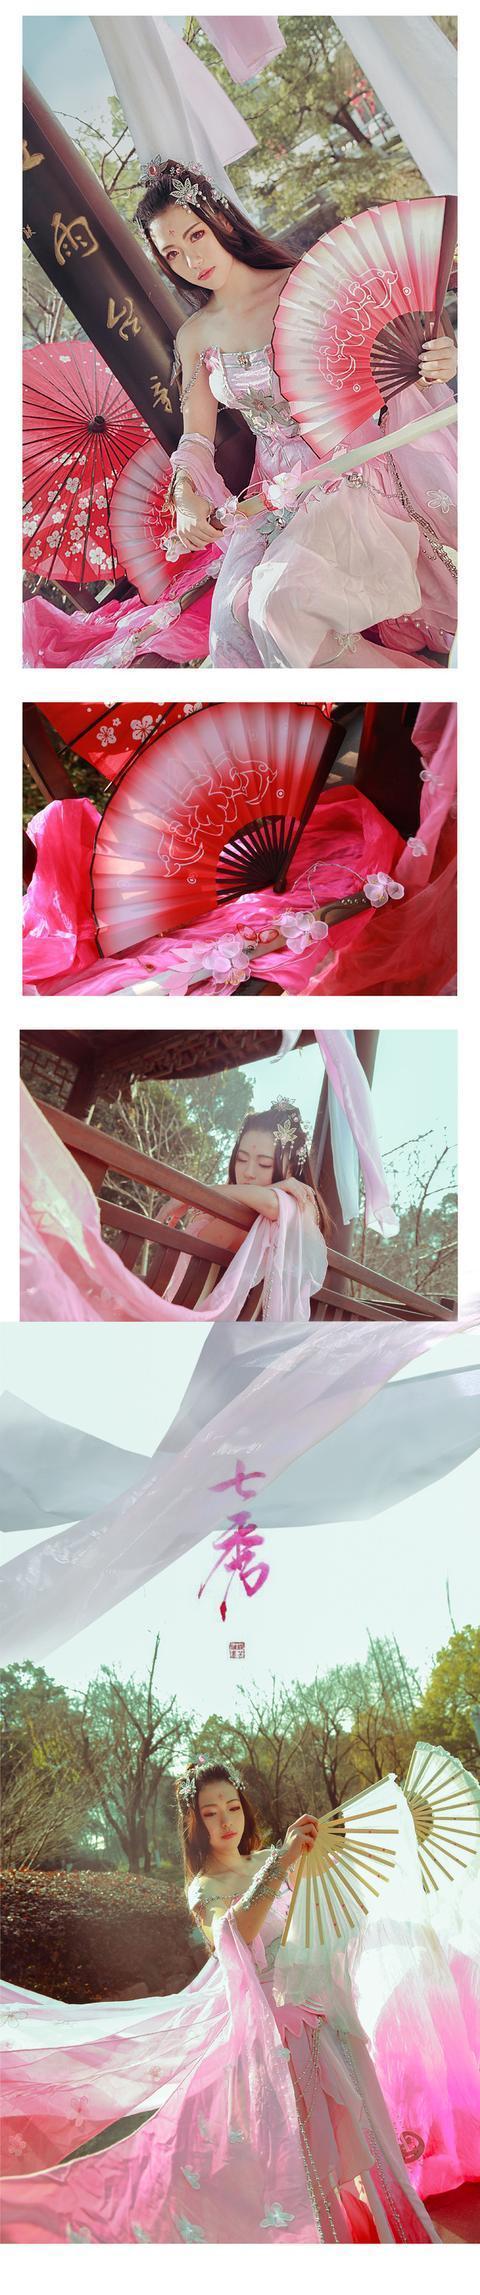 cosplay:劍俠情緣網絡版三 秦風七秀成女